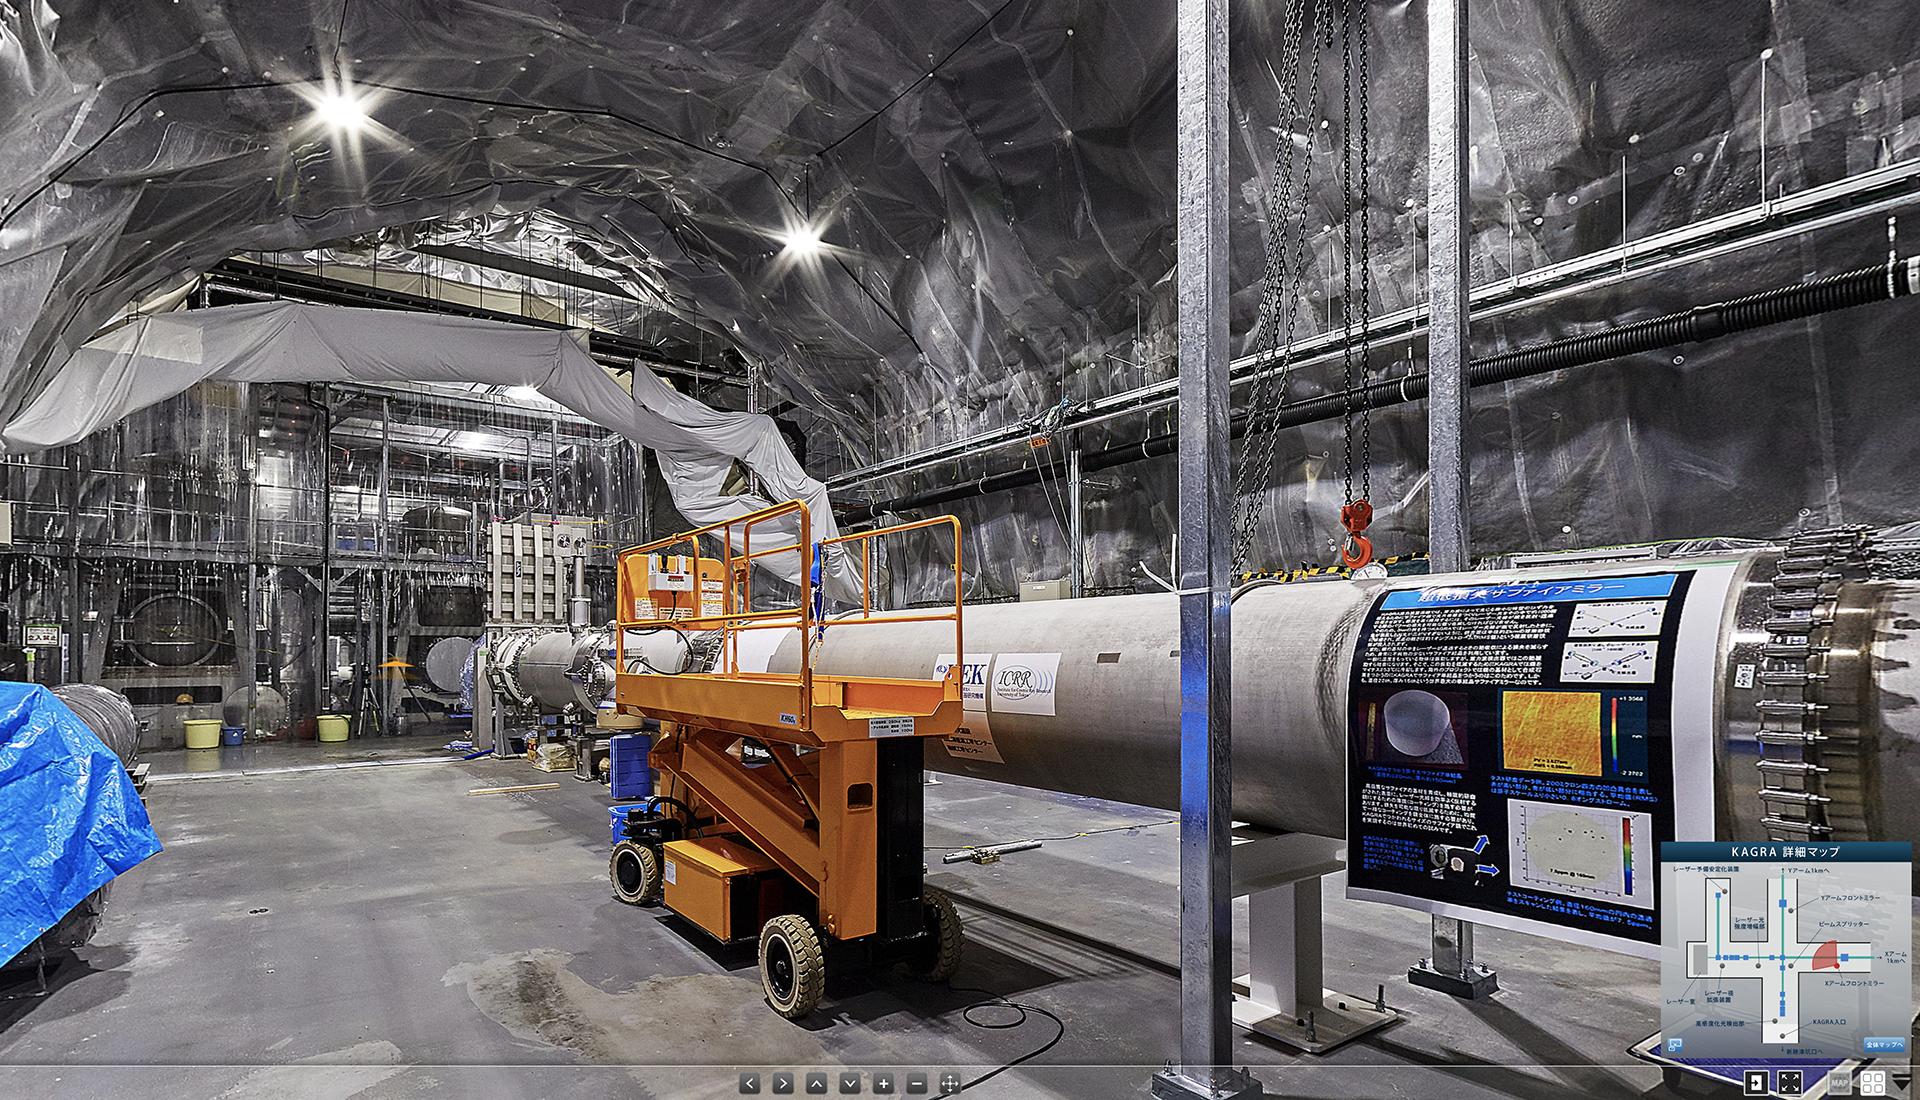 LIGO-Virgoの発表を受けての梶田所長のコメント